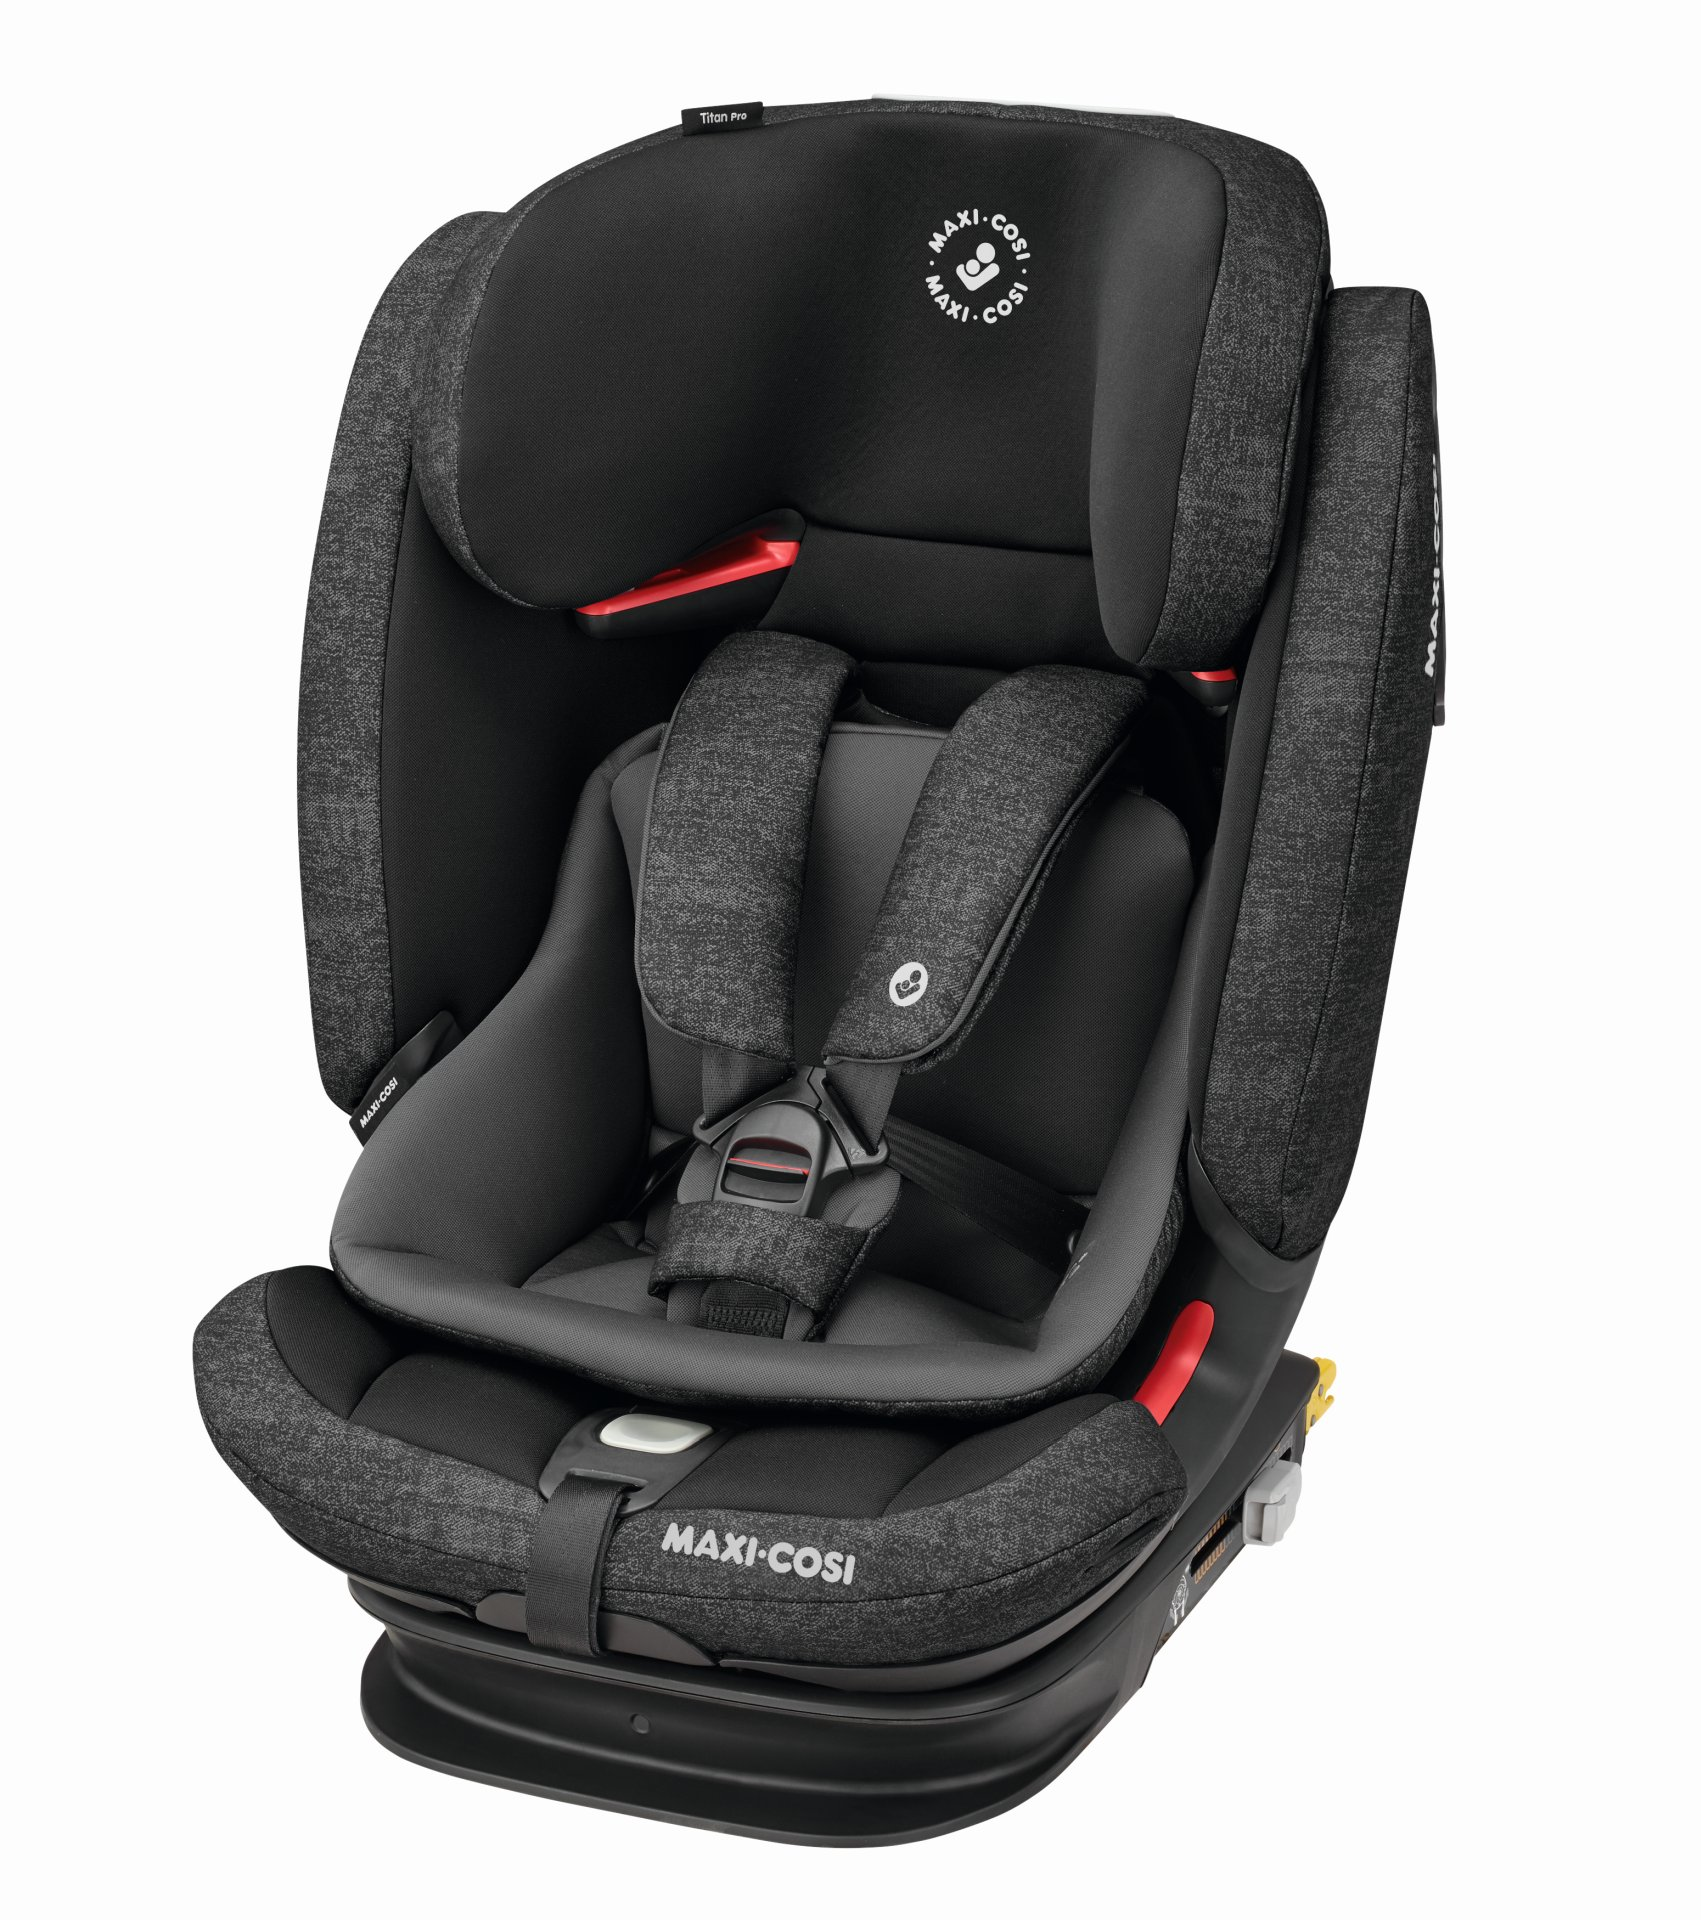 maxi cosi child car seat titan pro 2019 nomad black buy at kidsroom car seats